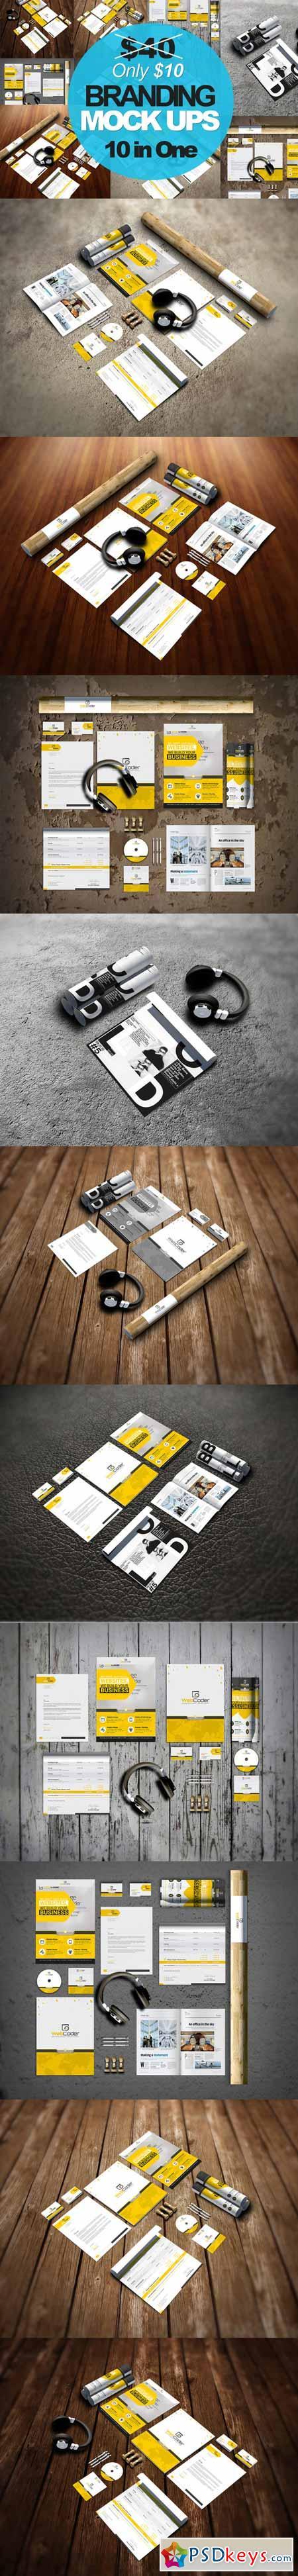 Stationery Branding Mock-ups 350684